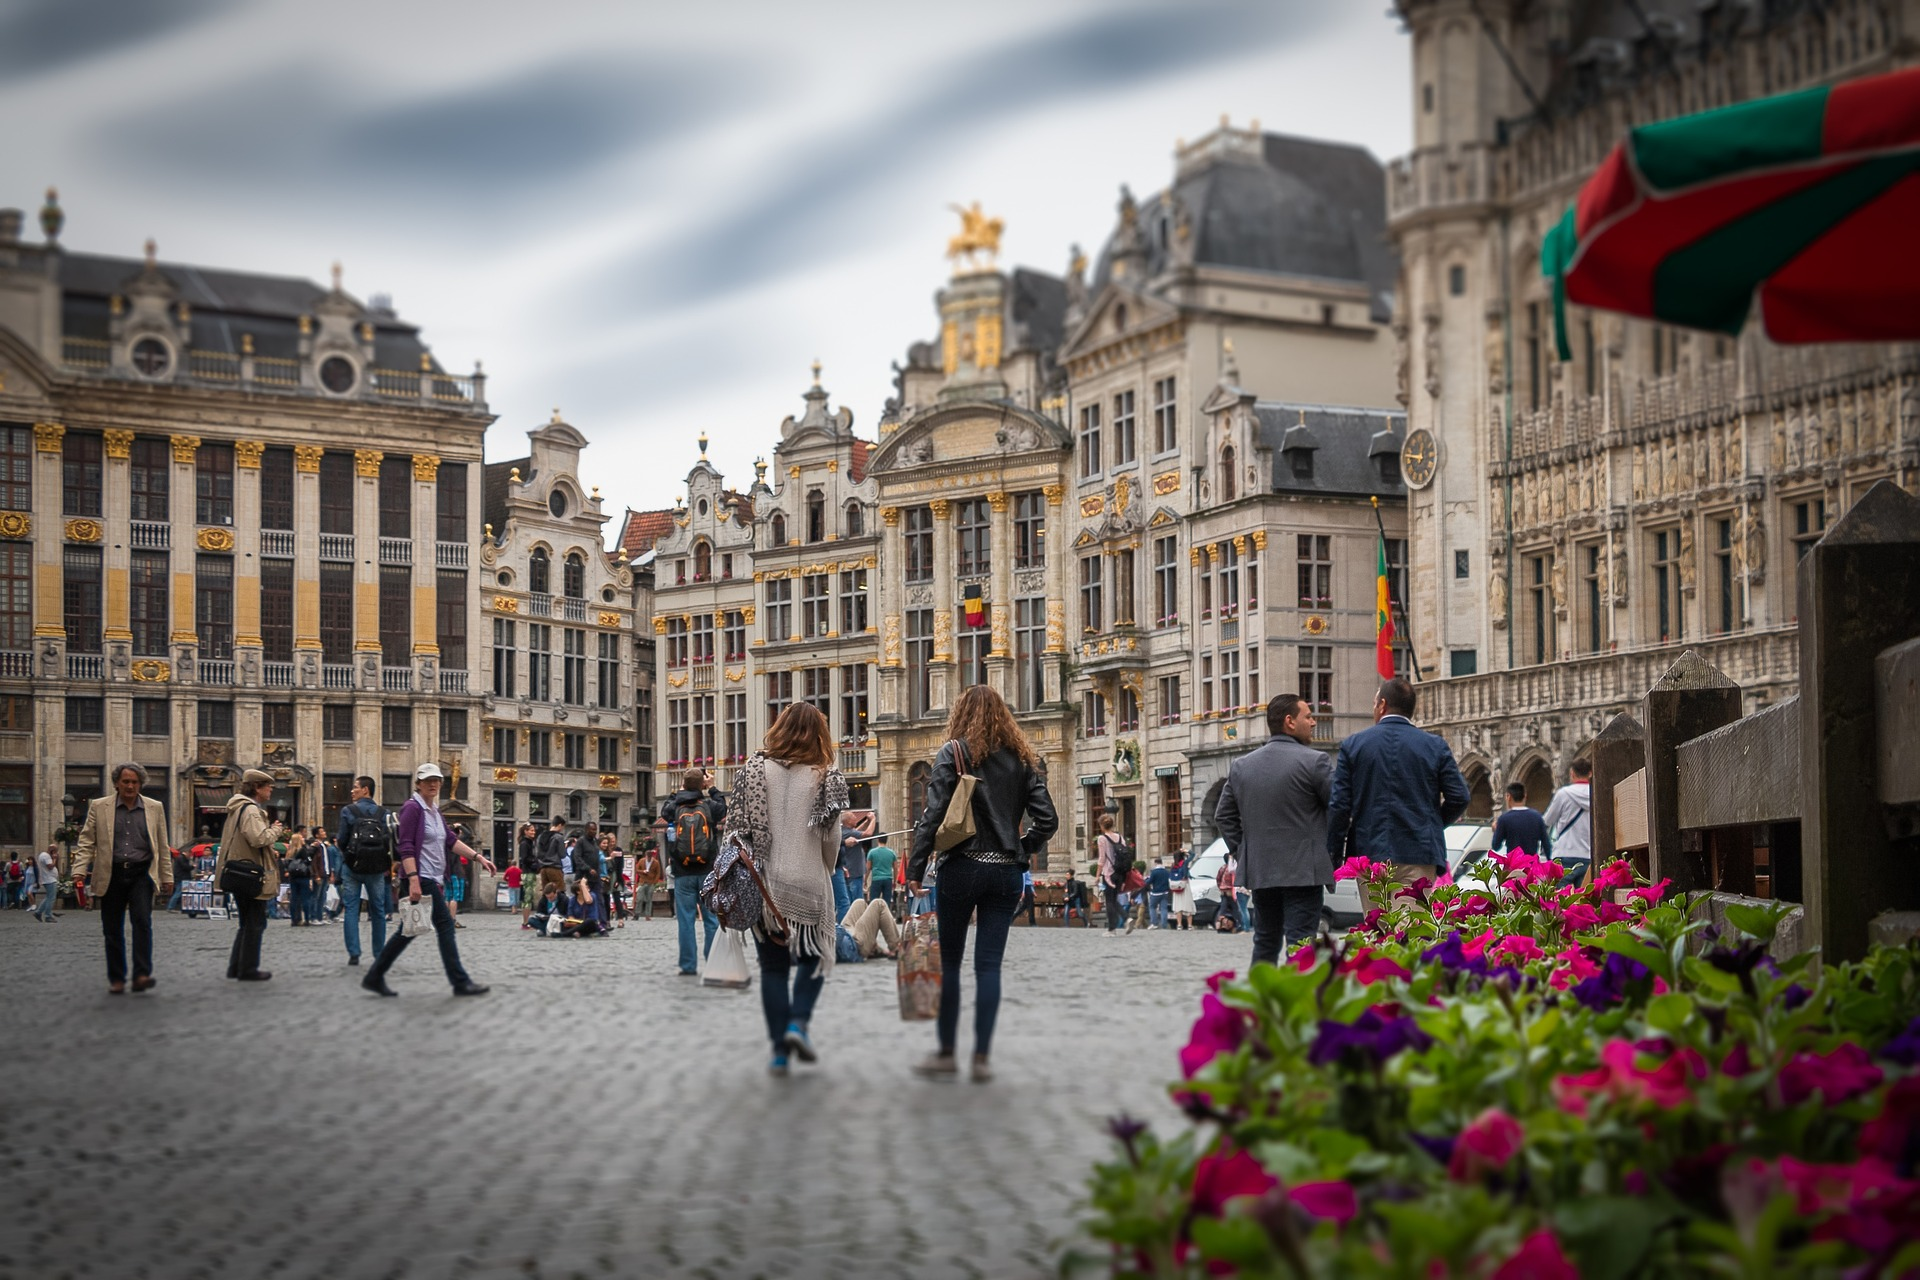 Marc bettinger belgien hauptstadt nyancraft 1-3 2-4 betting system